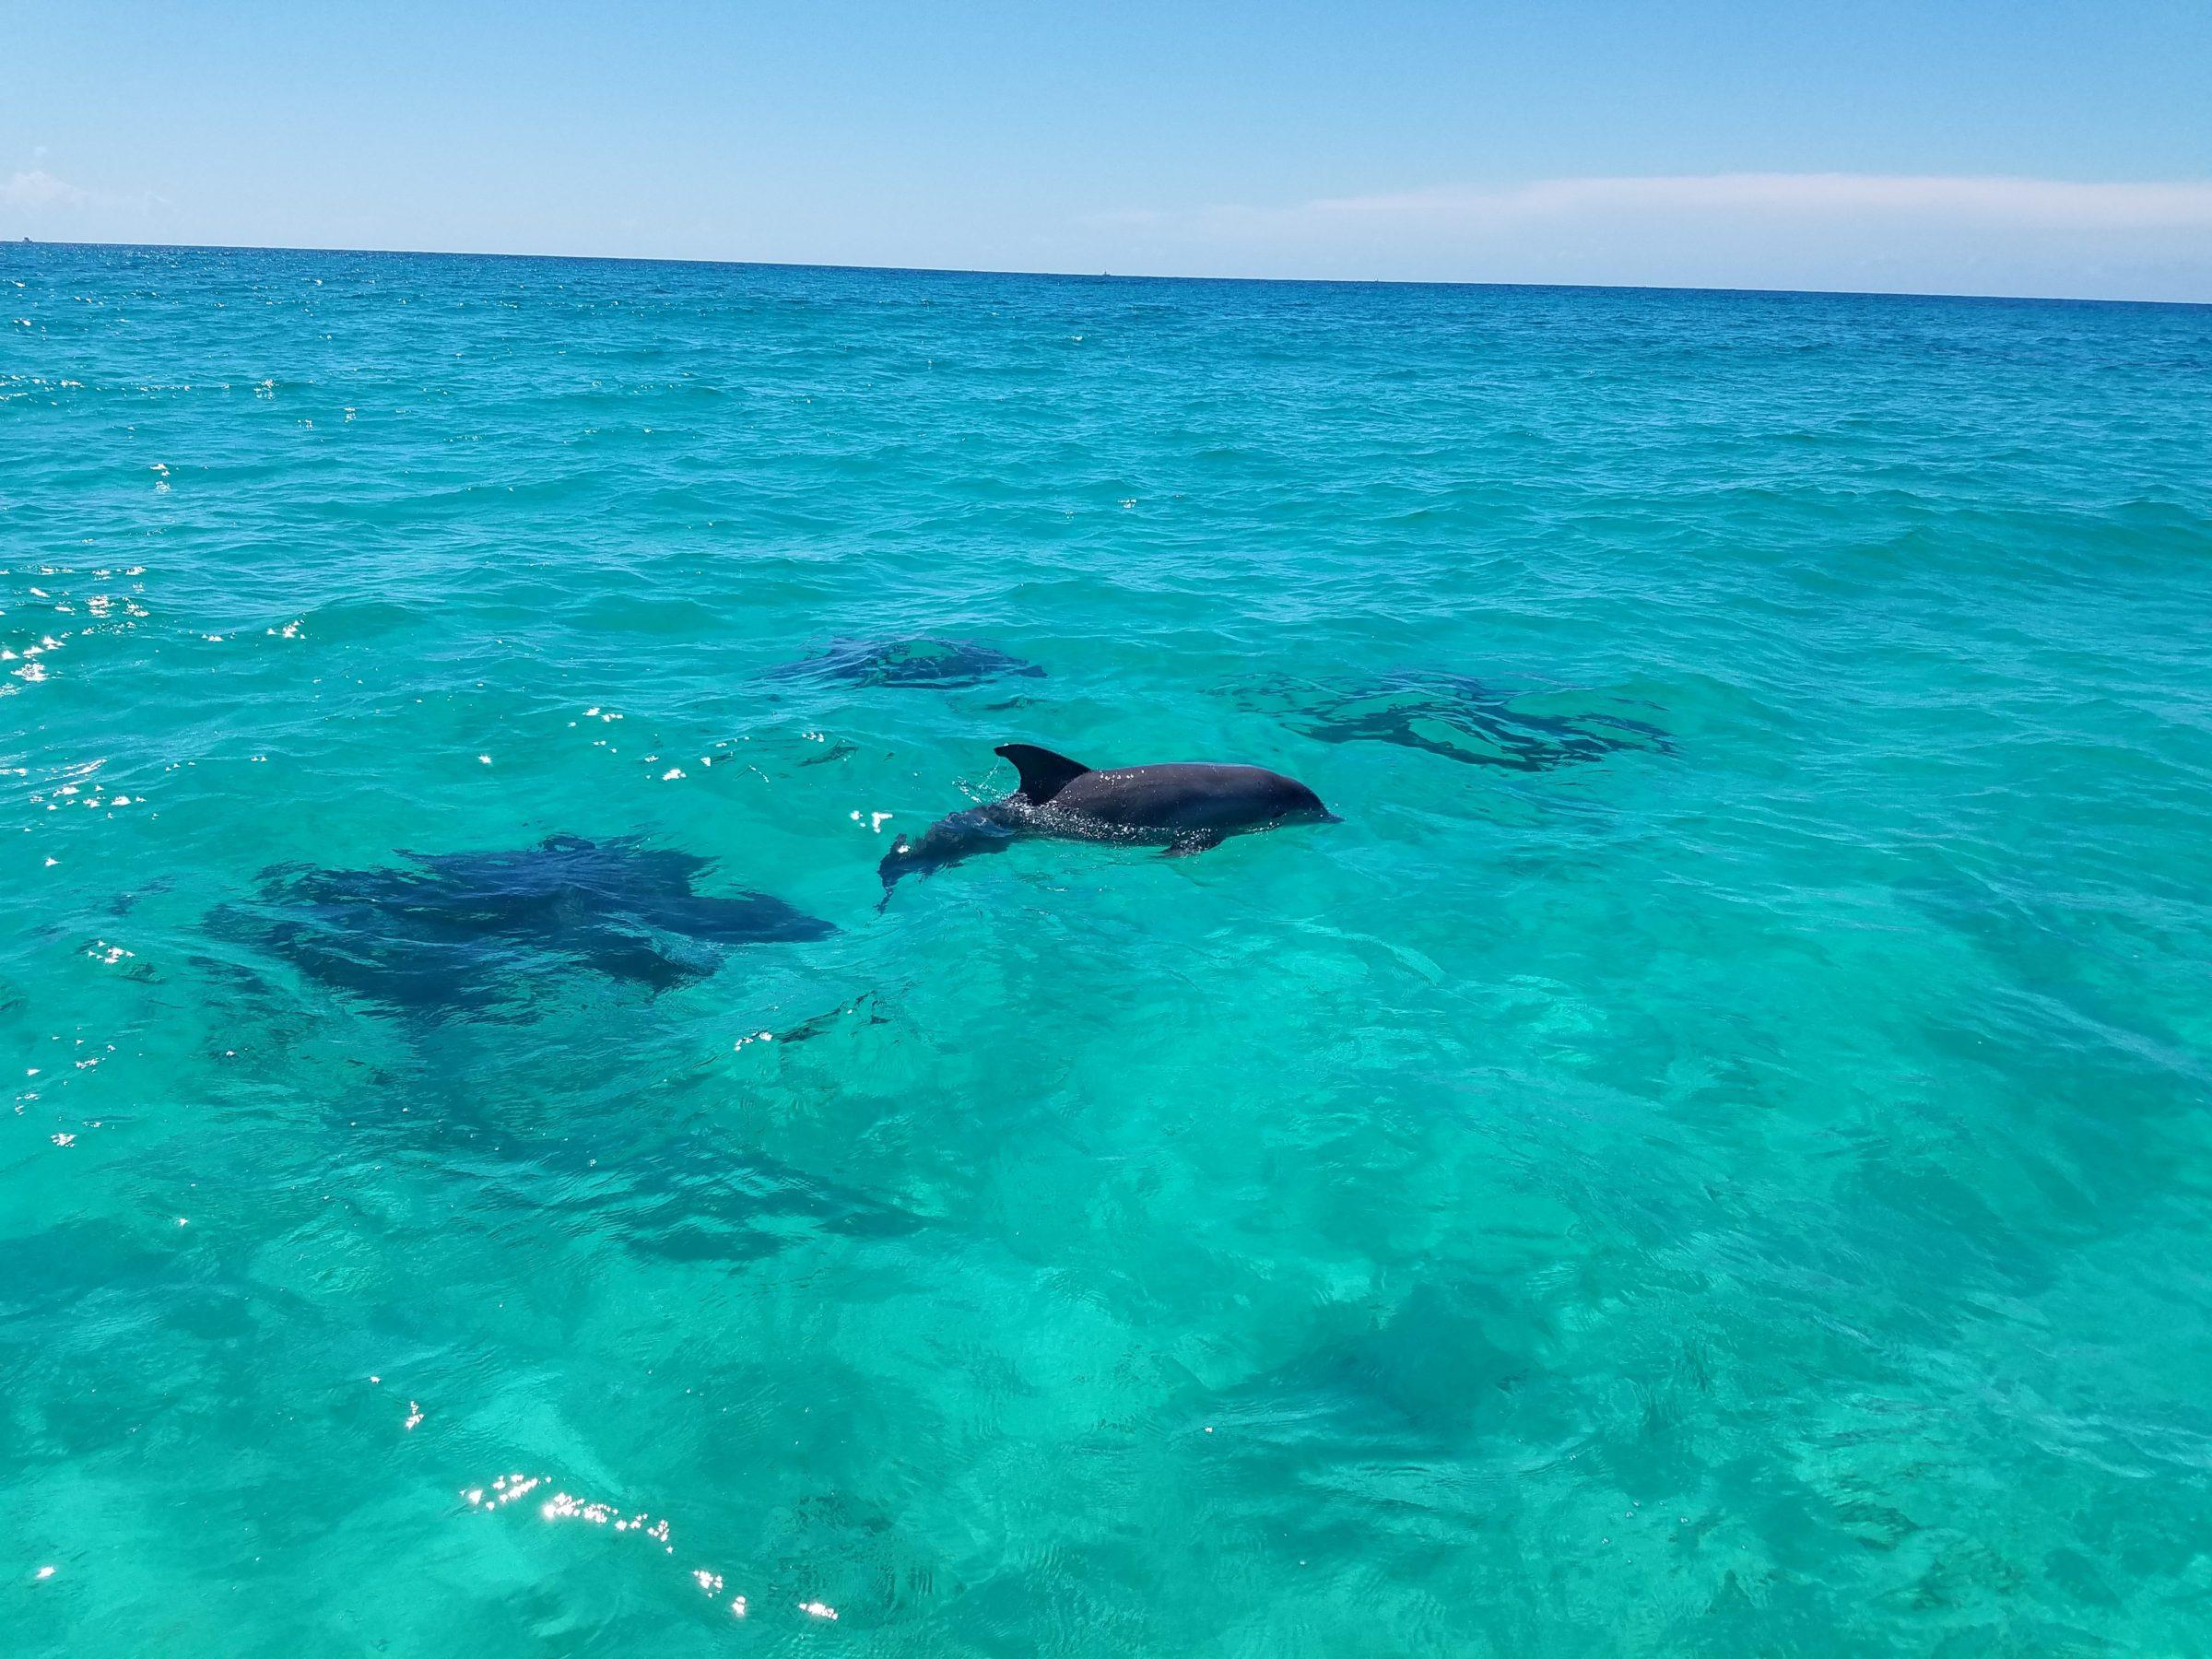 Destin Summer 2017 - Dolphin Cruises Aboard Our Catamaran Featured Image